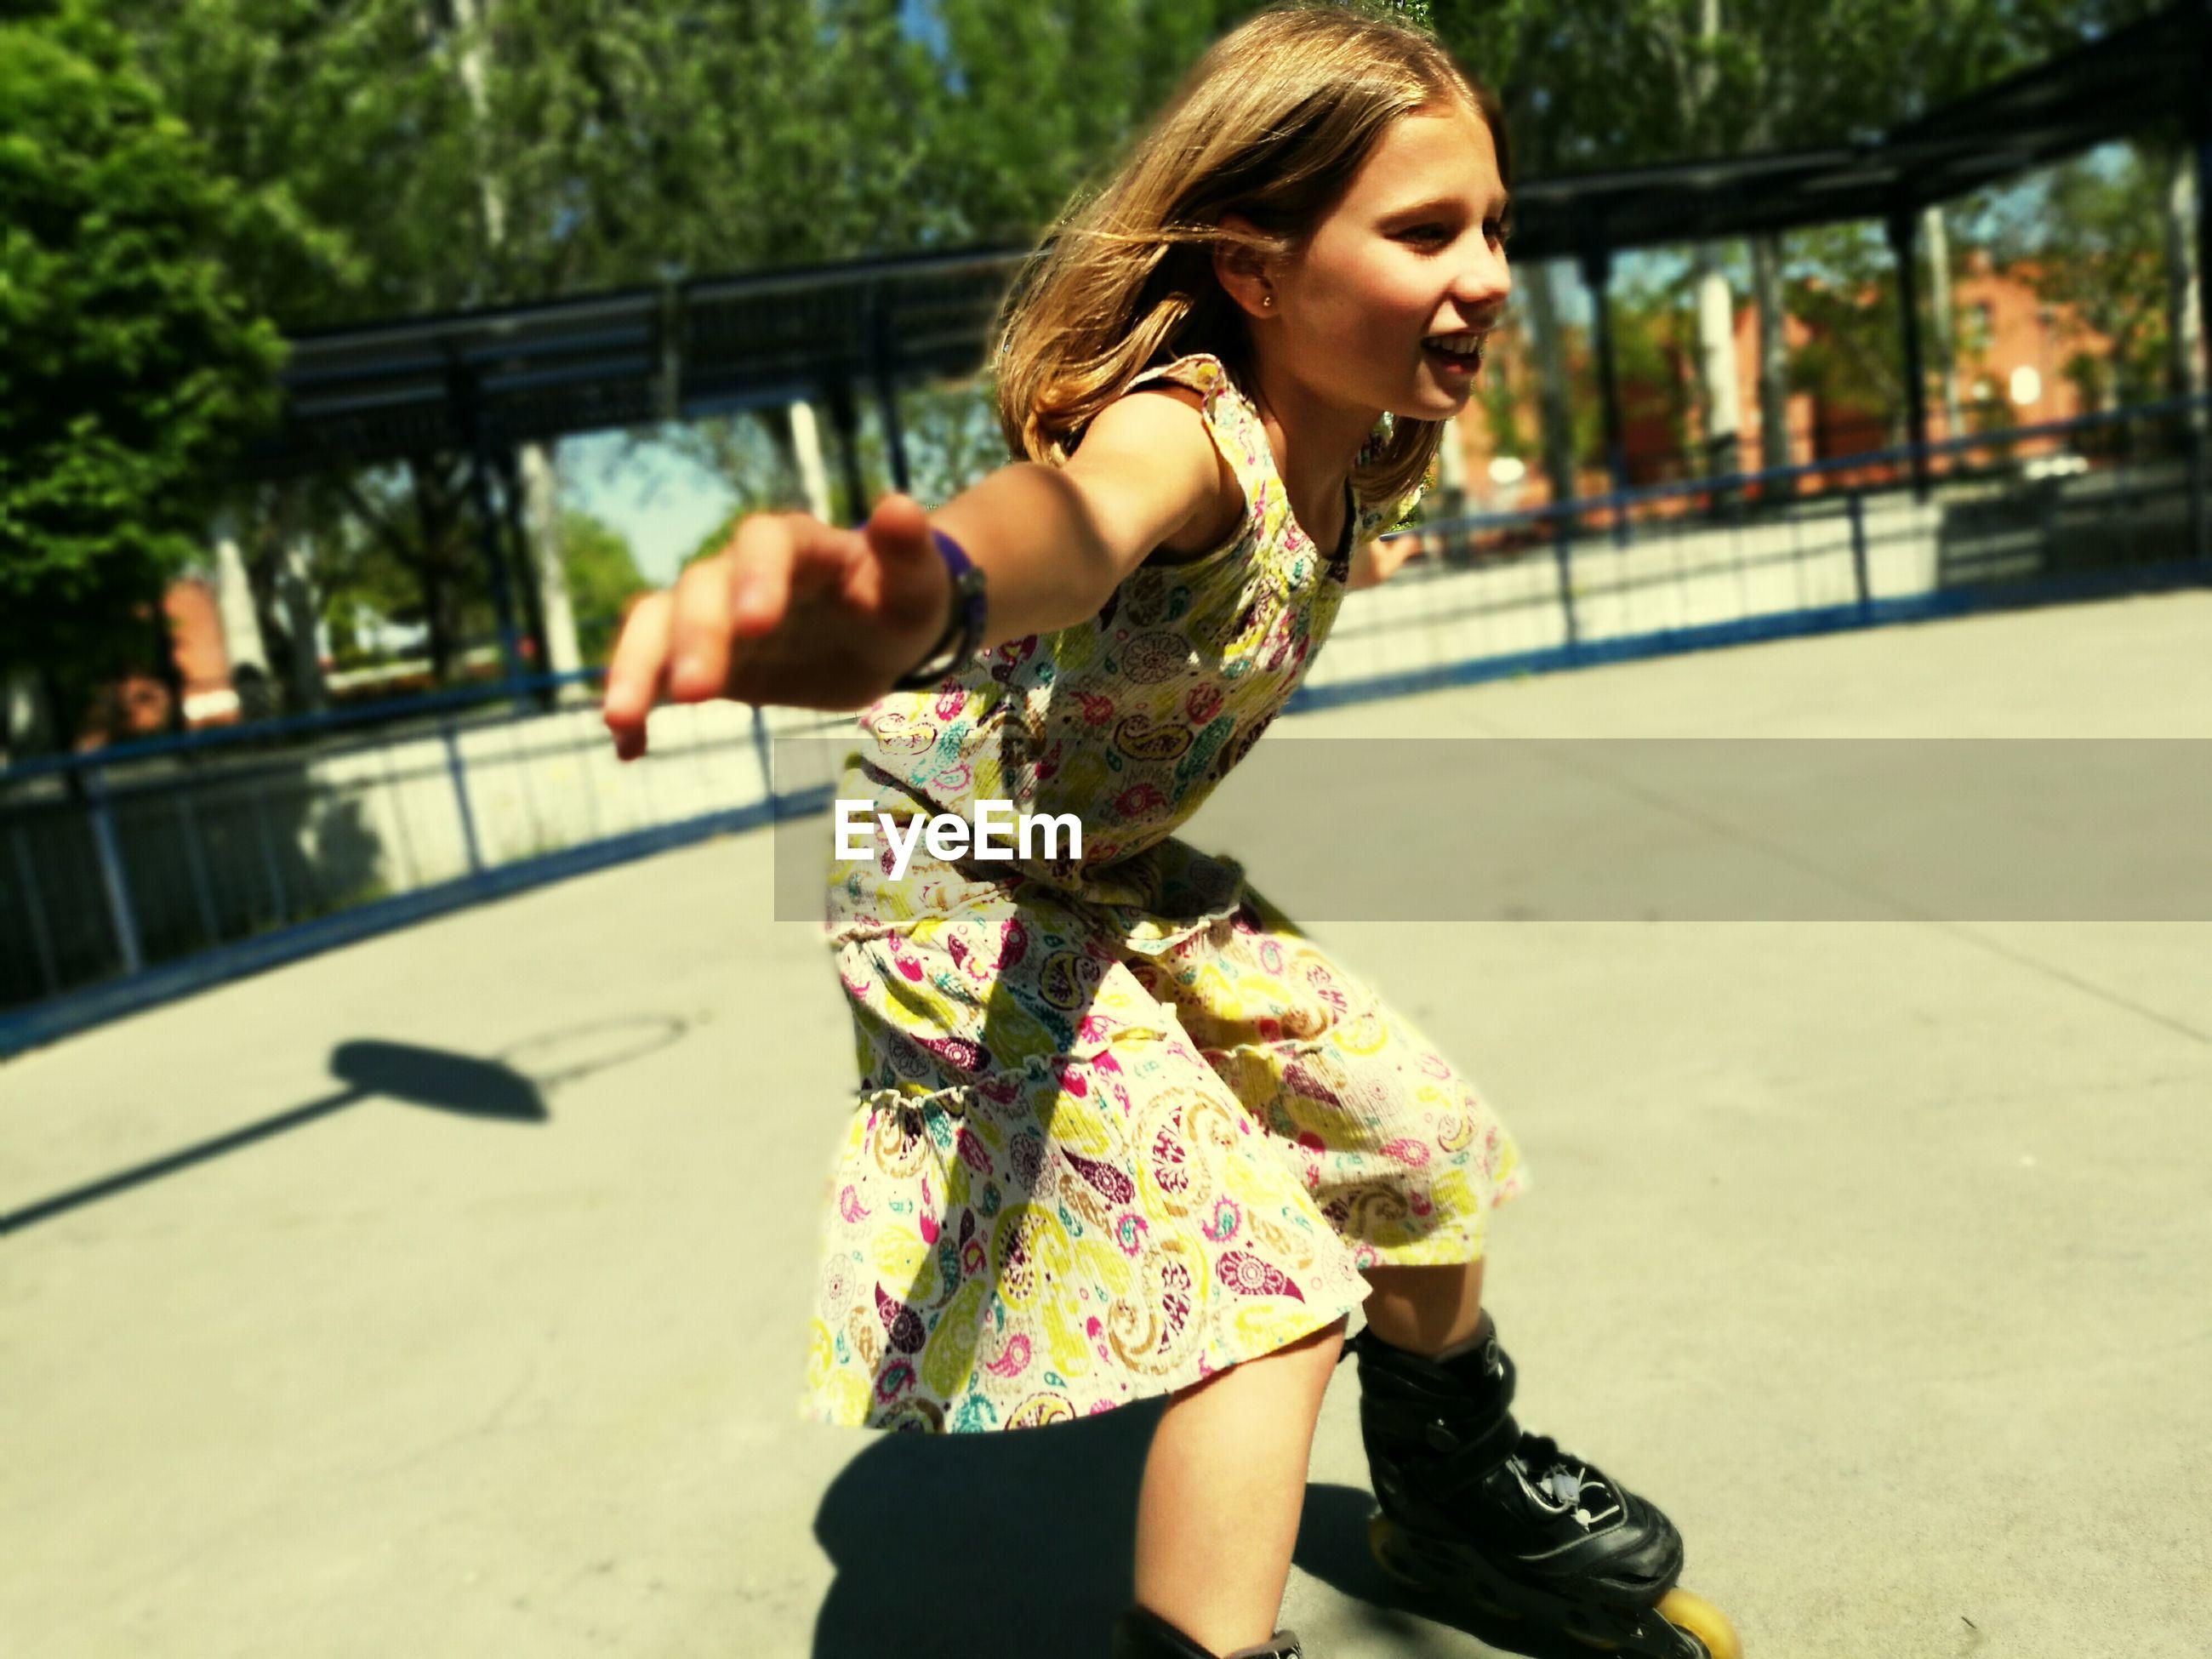 Playful girl inline skating at park